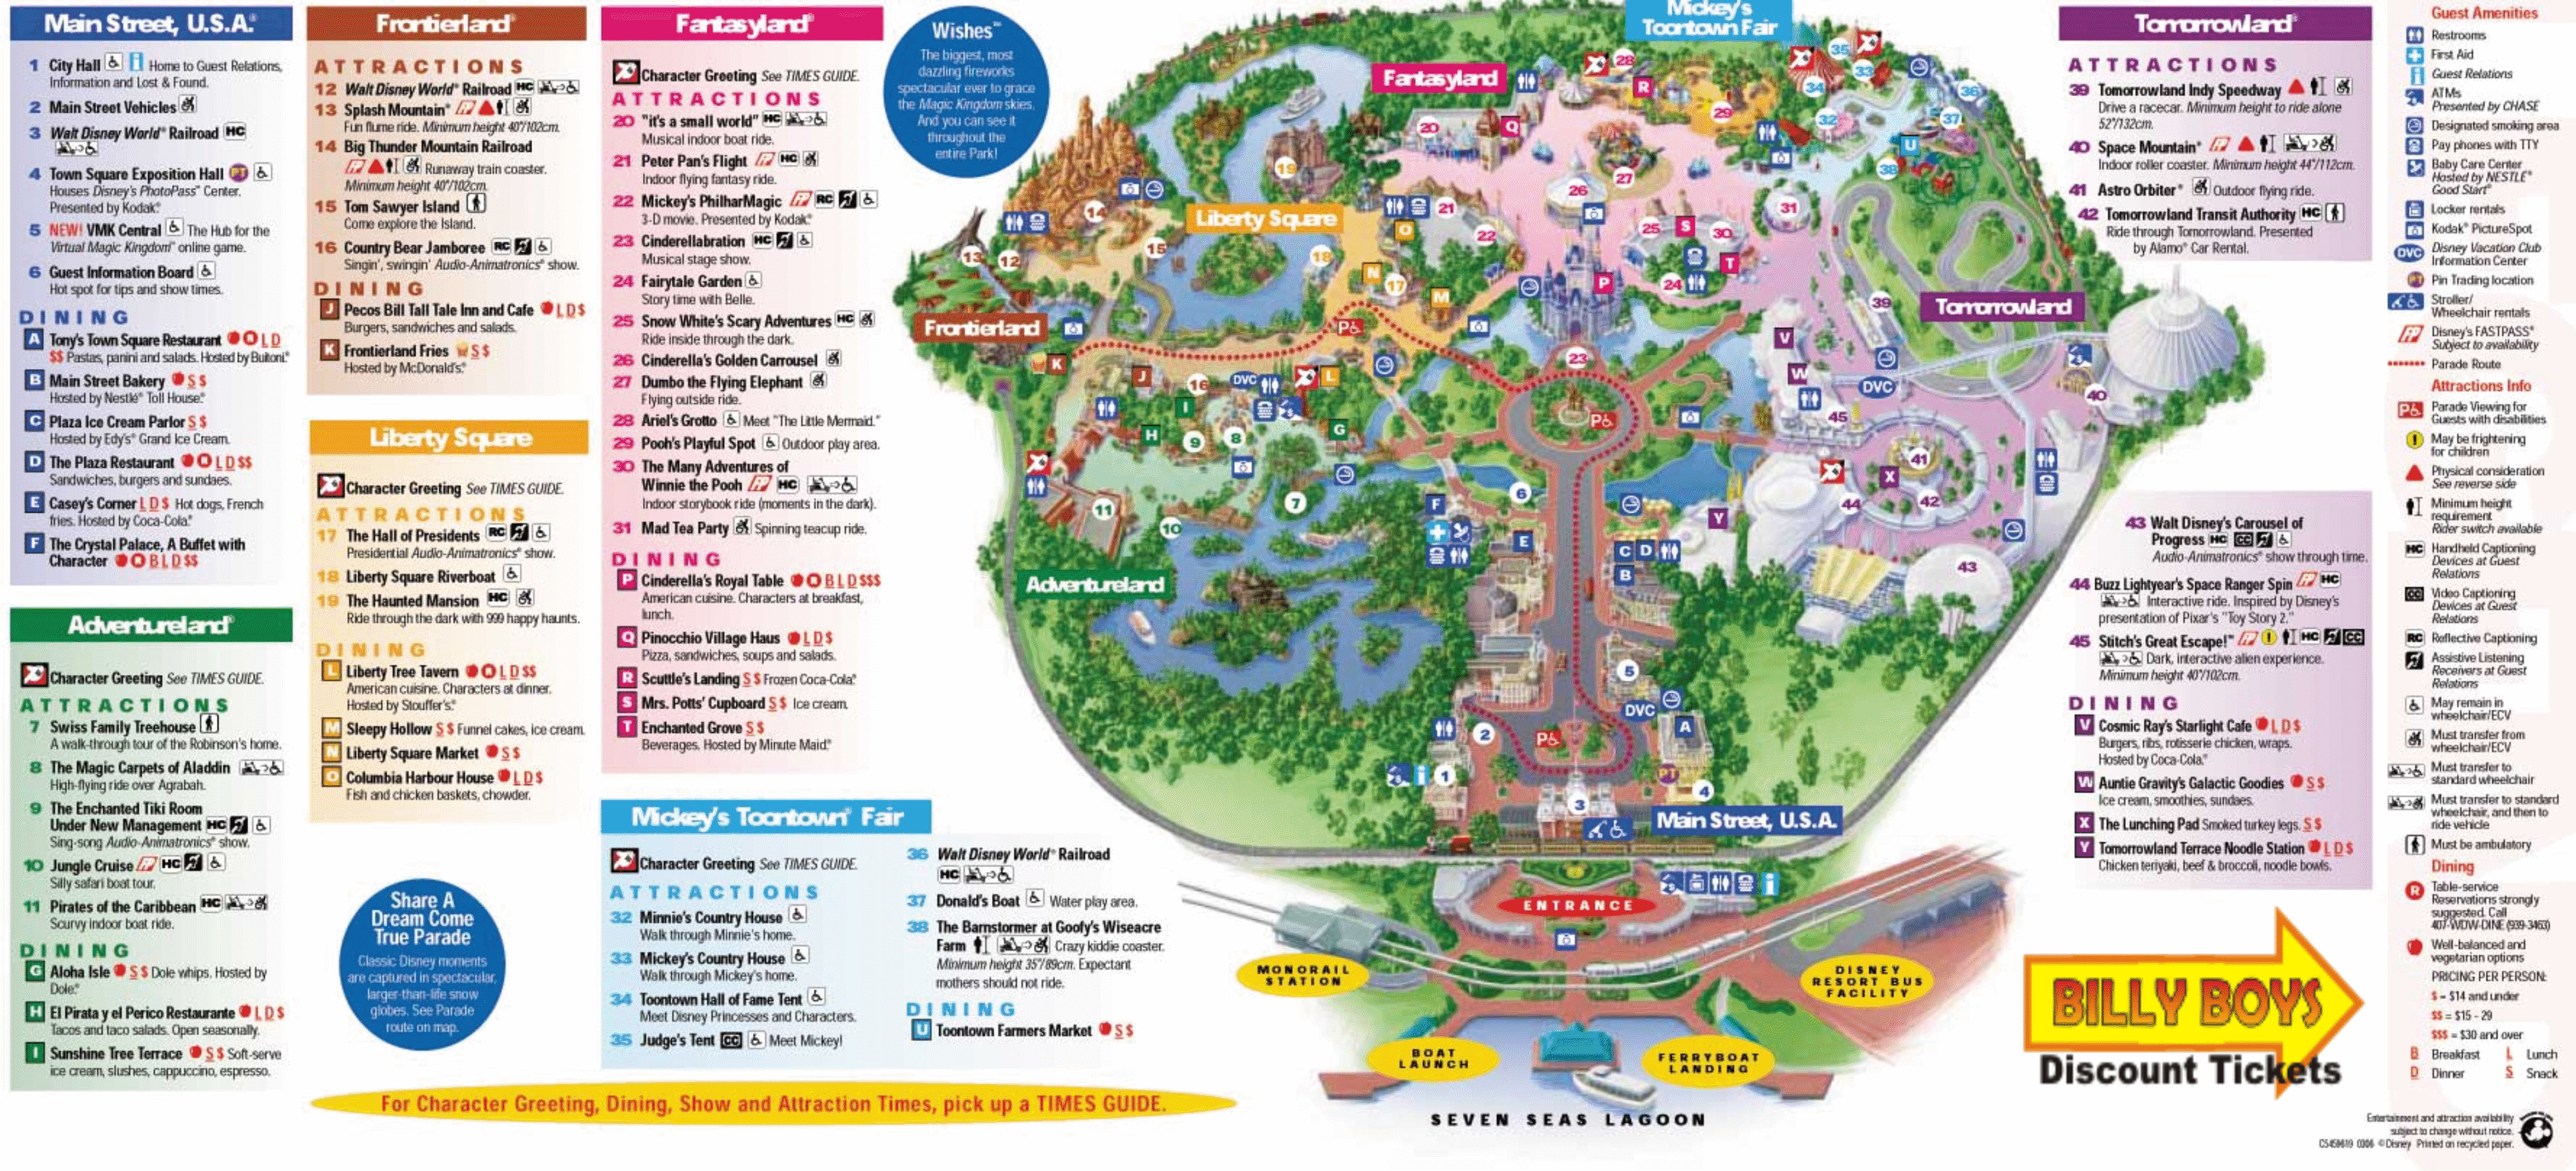 Disney World Florida Map From Ambergontrail 3 - Judecelestin2010 - Disney Parks Florida Map